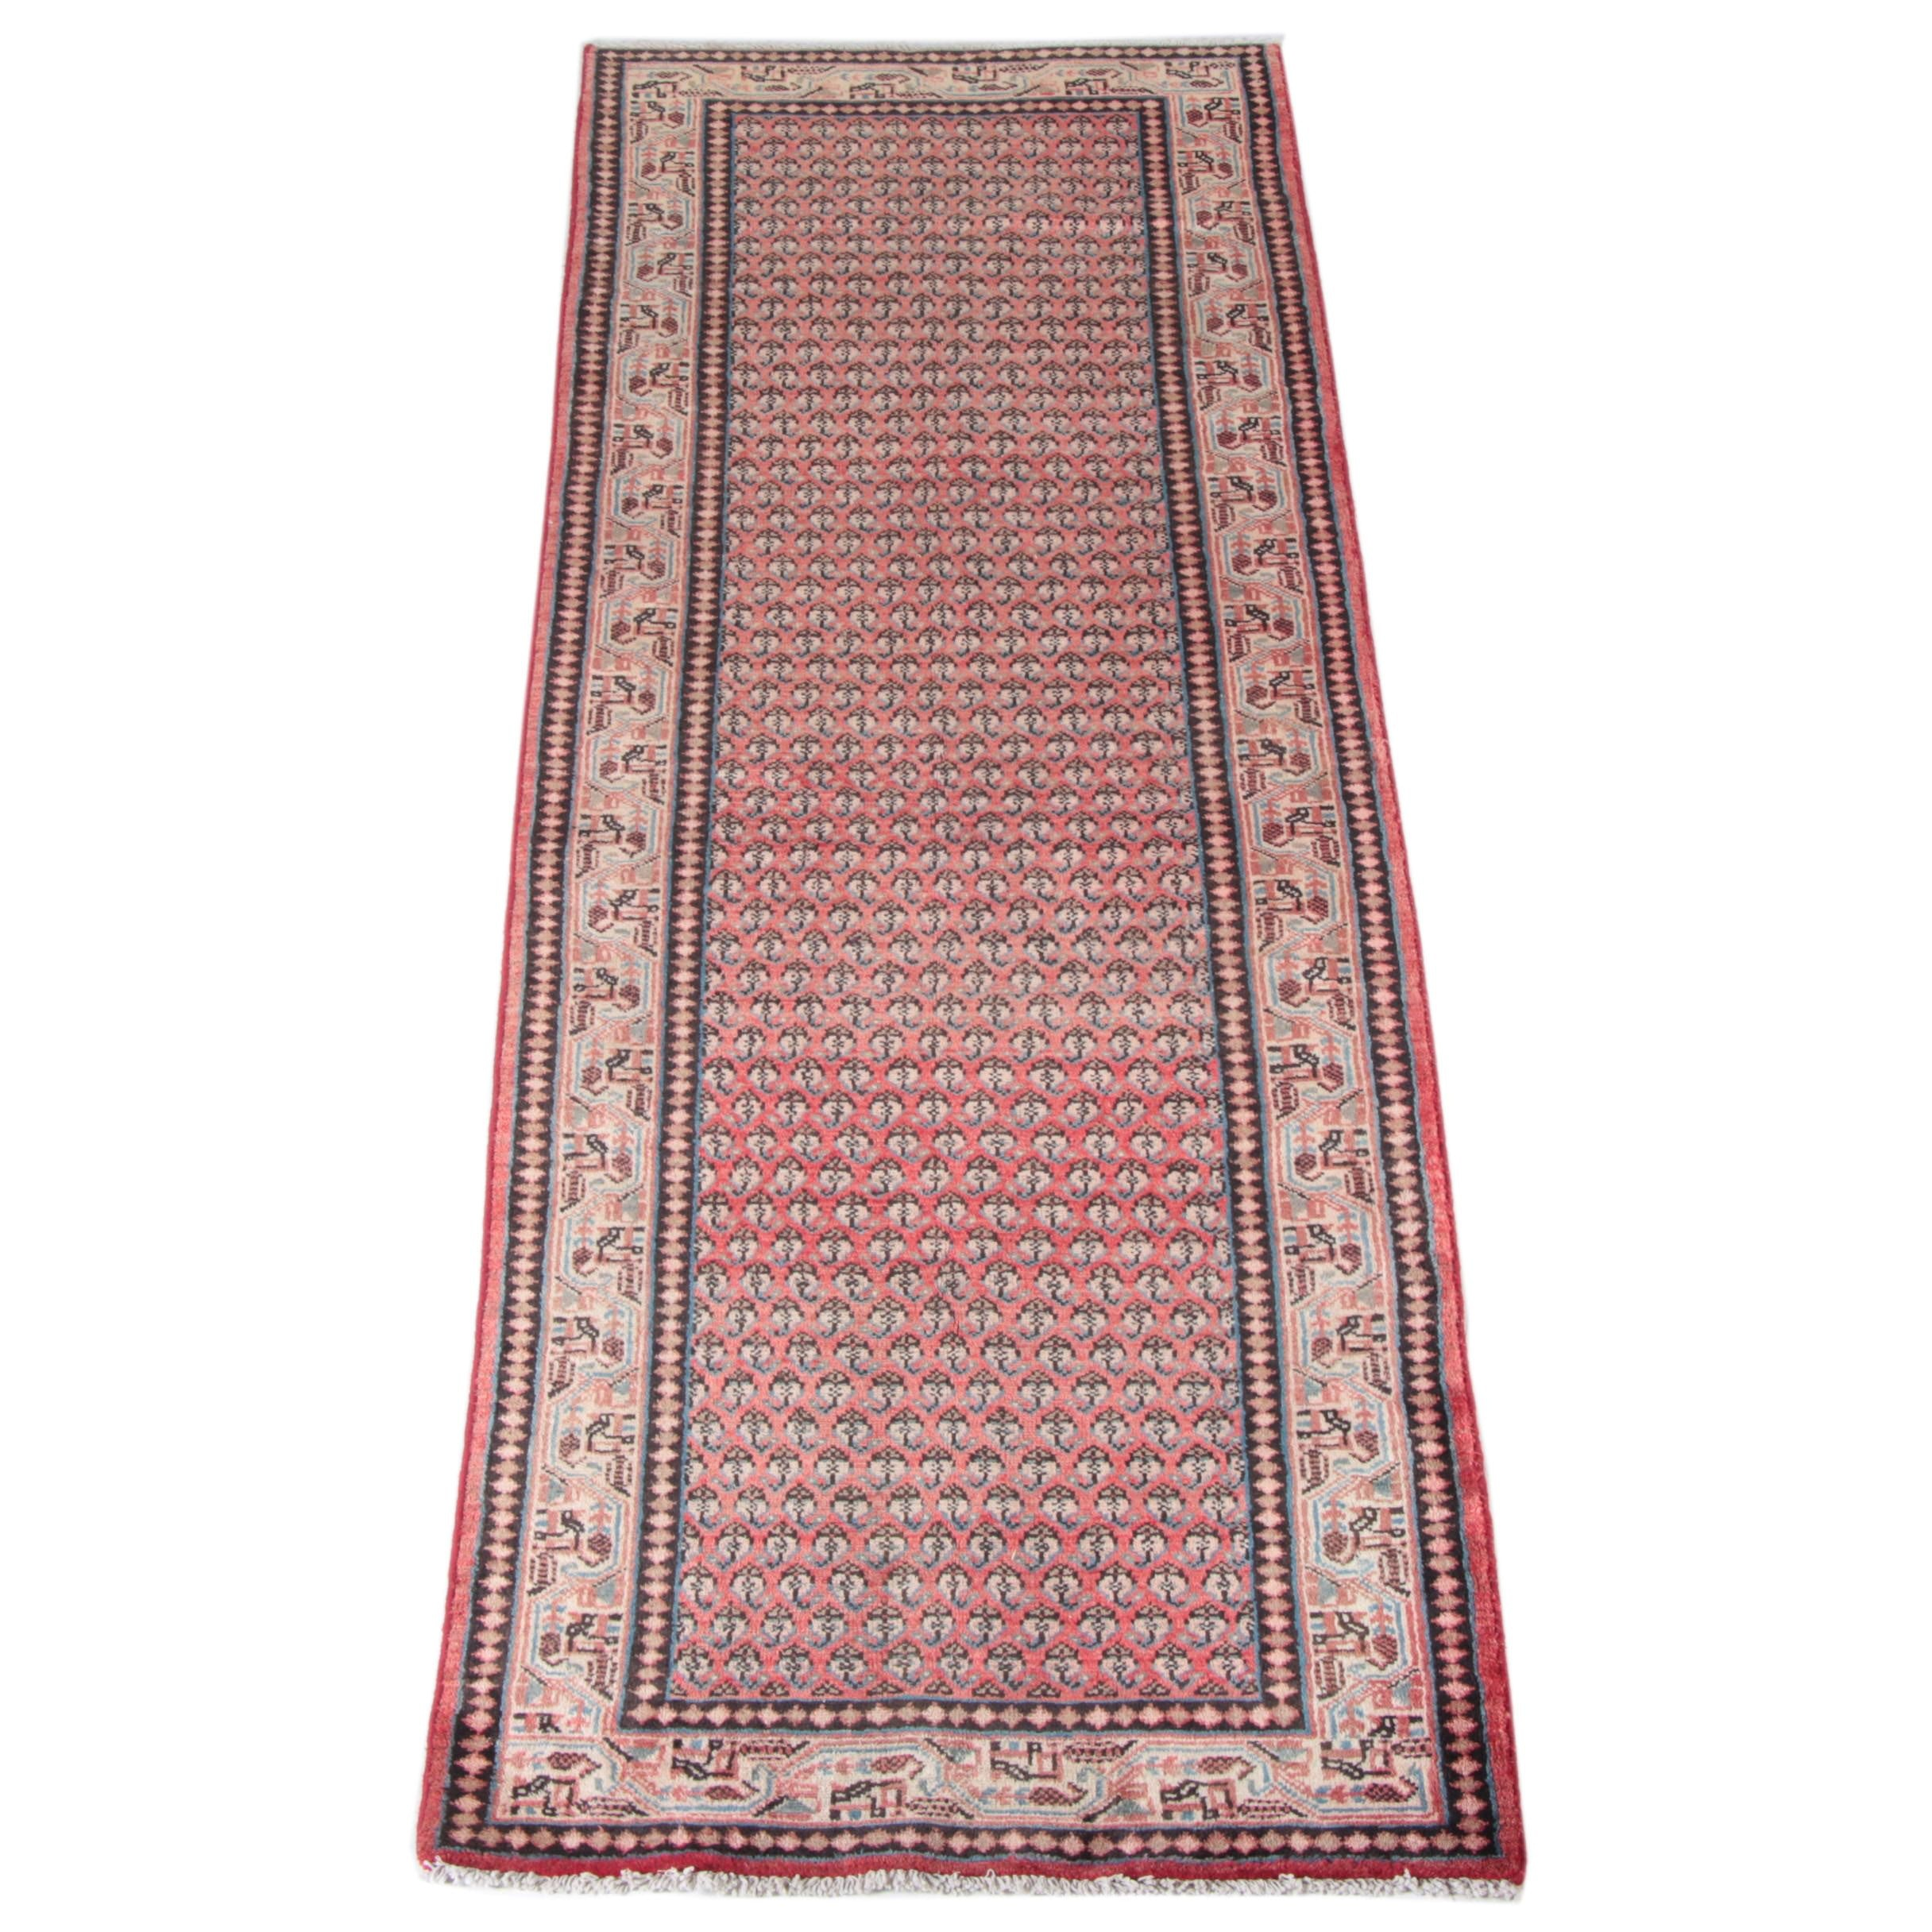 Hand-Knotted Mir-A-Boteh Carpet Runner